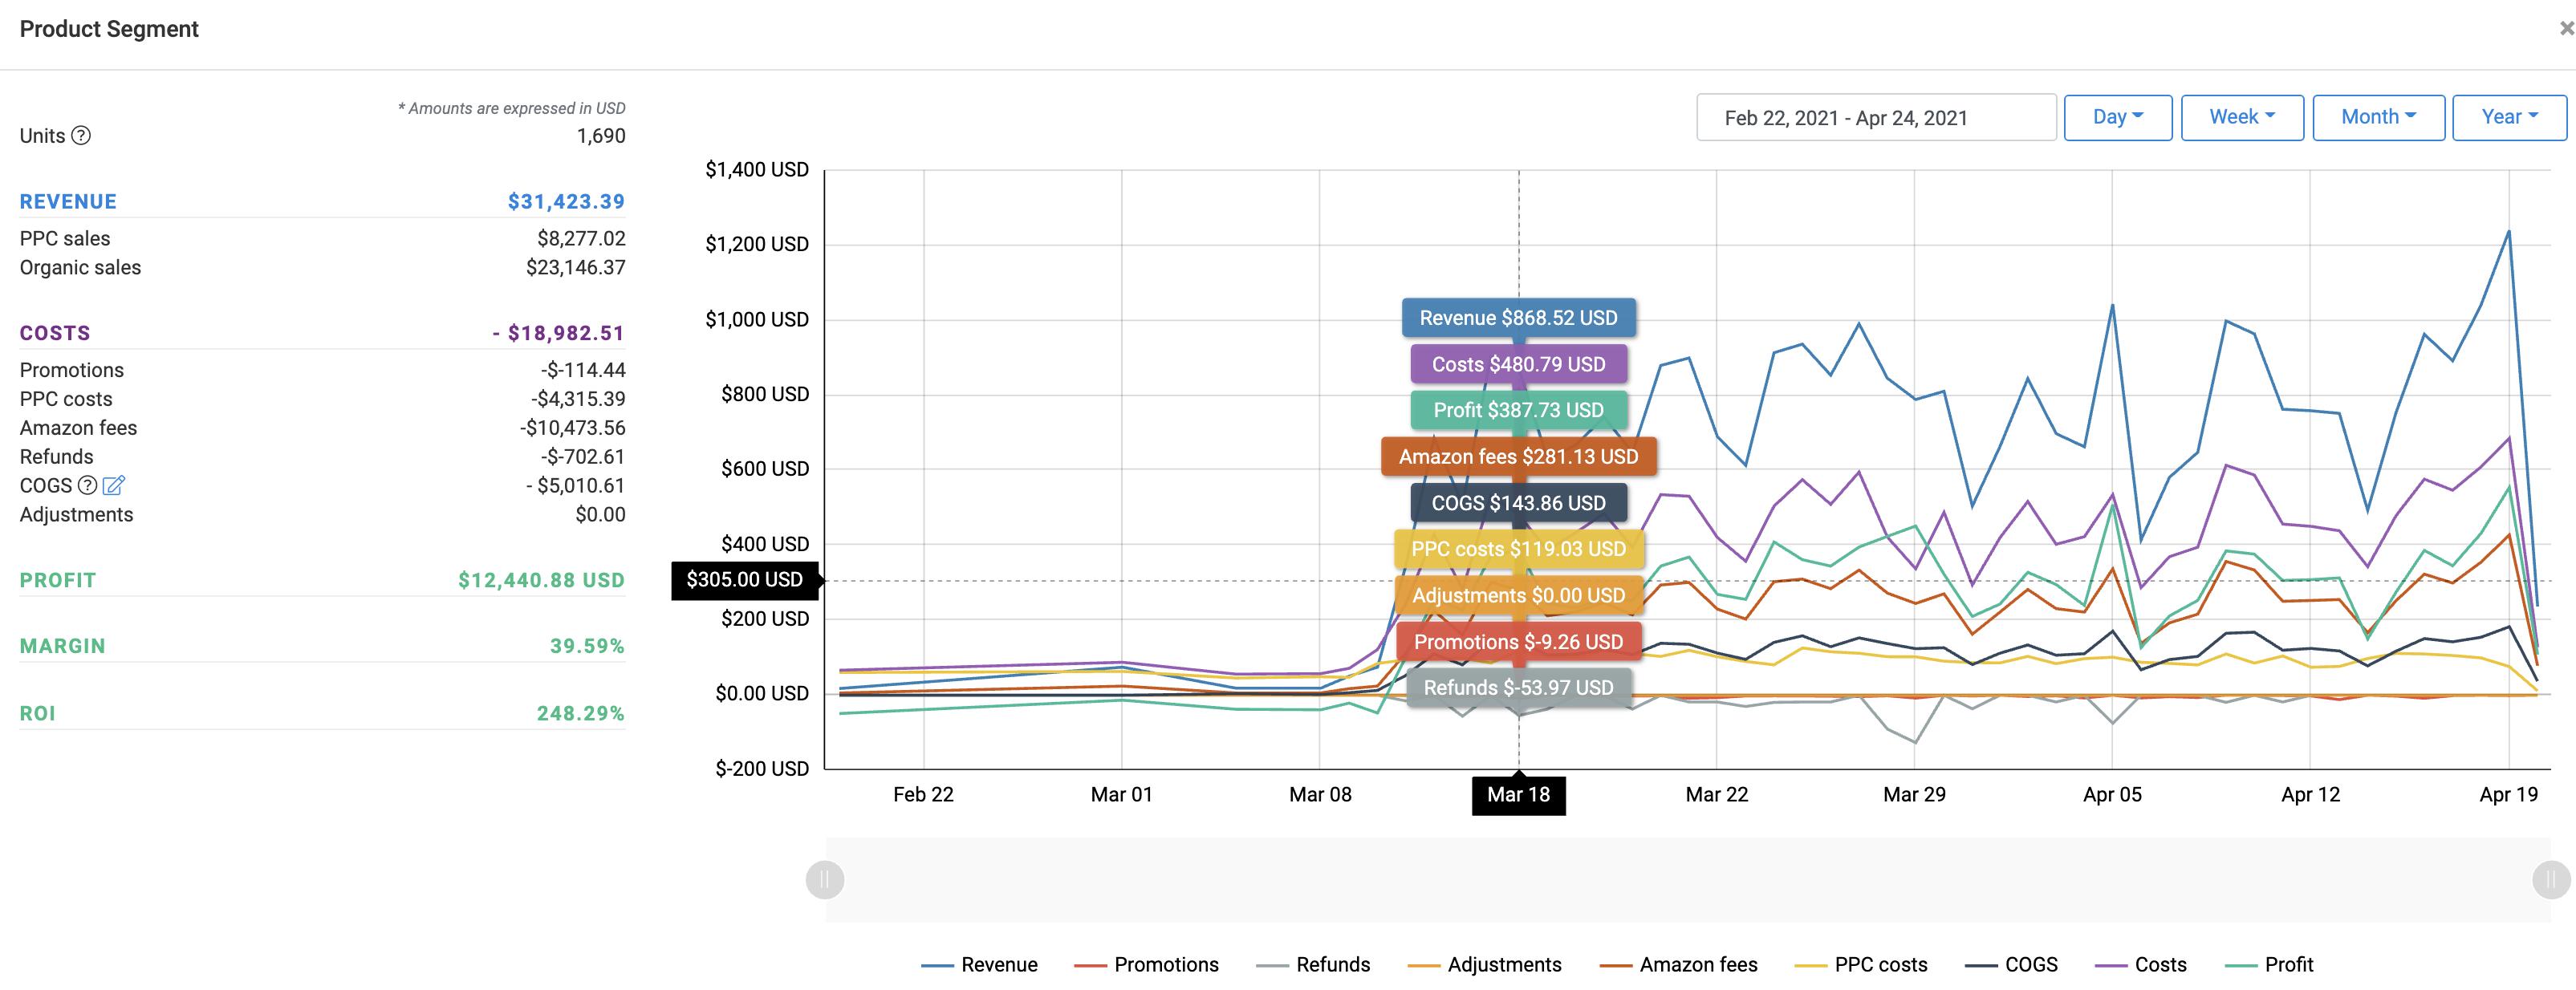 Product Segments SOP - Sales Breakdown & Graph